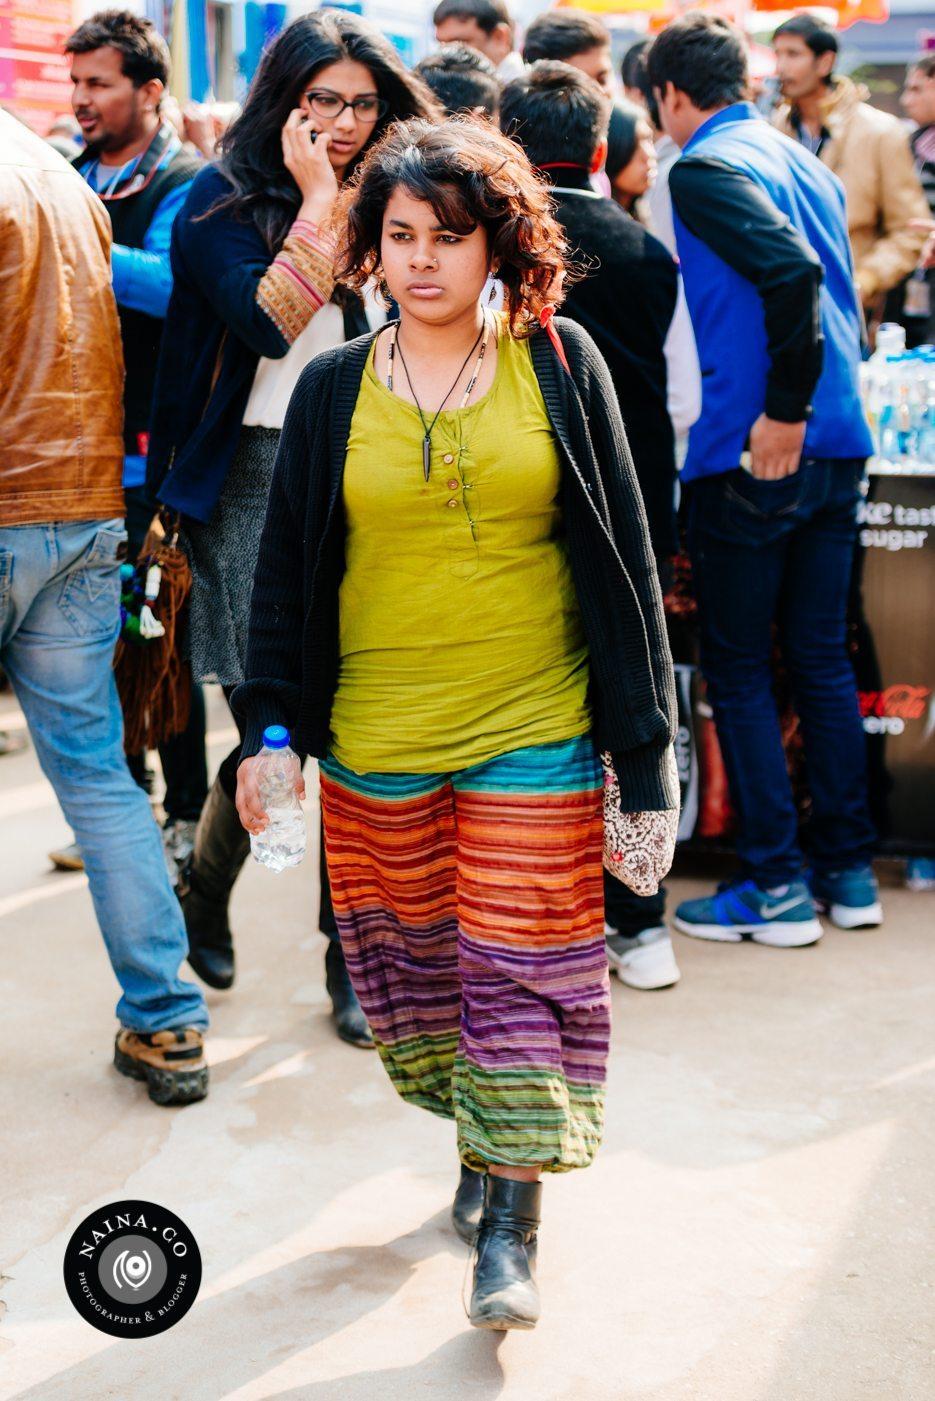 Naina.co-Raconteuse-Visuelle-Photographer-Blogger-Storyteller-Luxury-Lifestyle-January-2015-Jaipur-Literature-Festival-StRegis-LeMeridien-ZeeJLF-EyesForStreetStyle-42